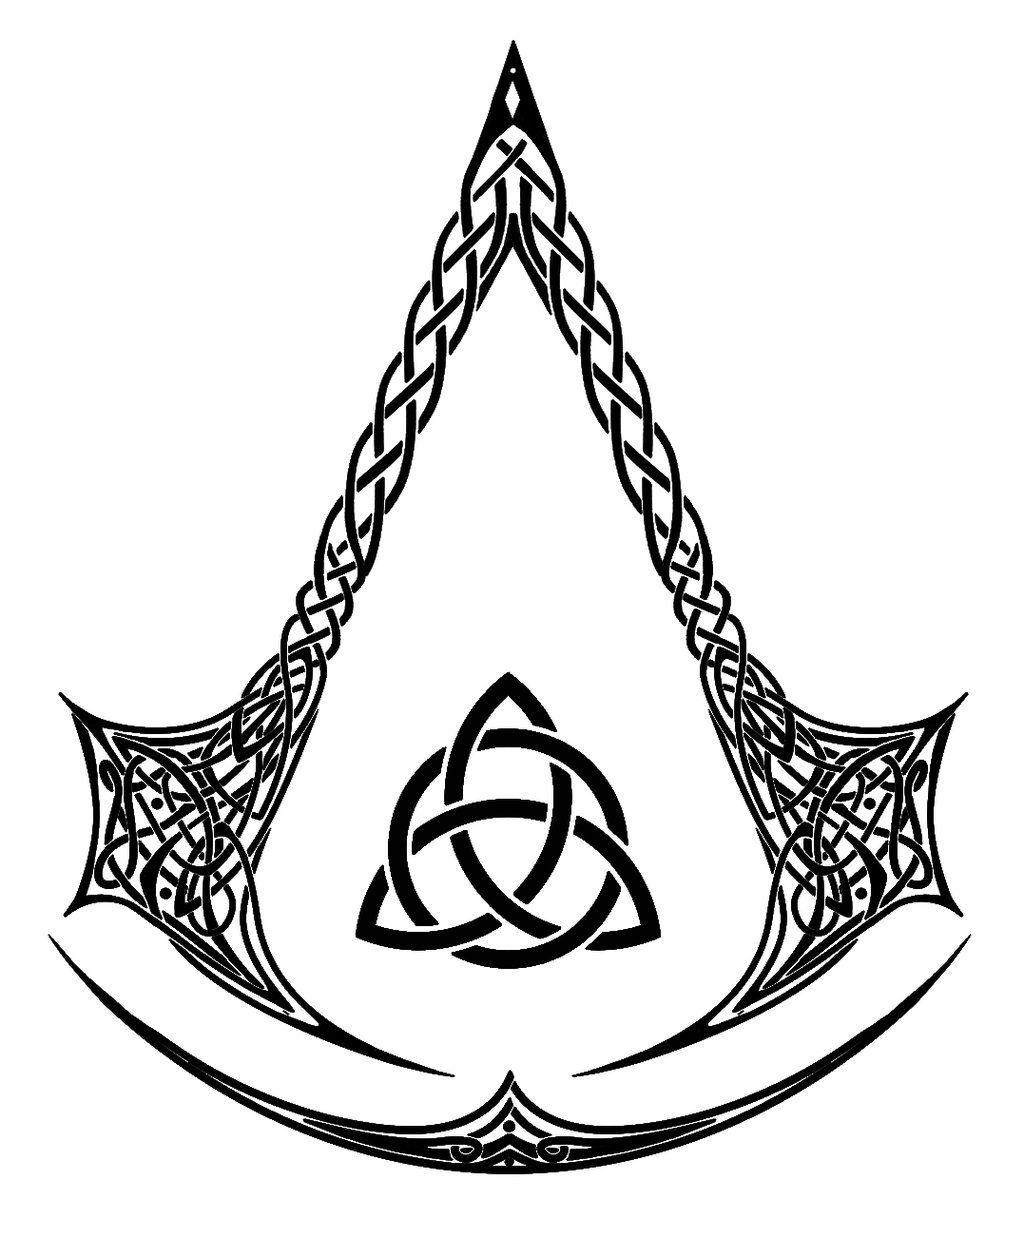 Celtic Assassins Black and white by aFletcherKinnear